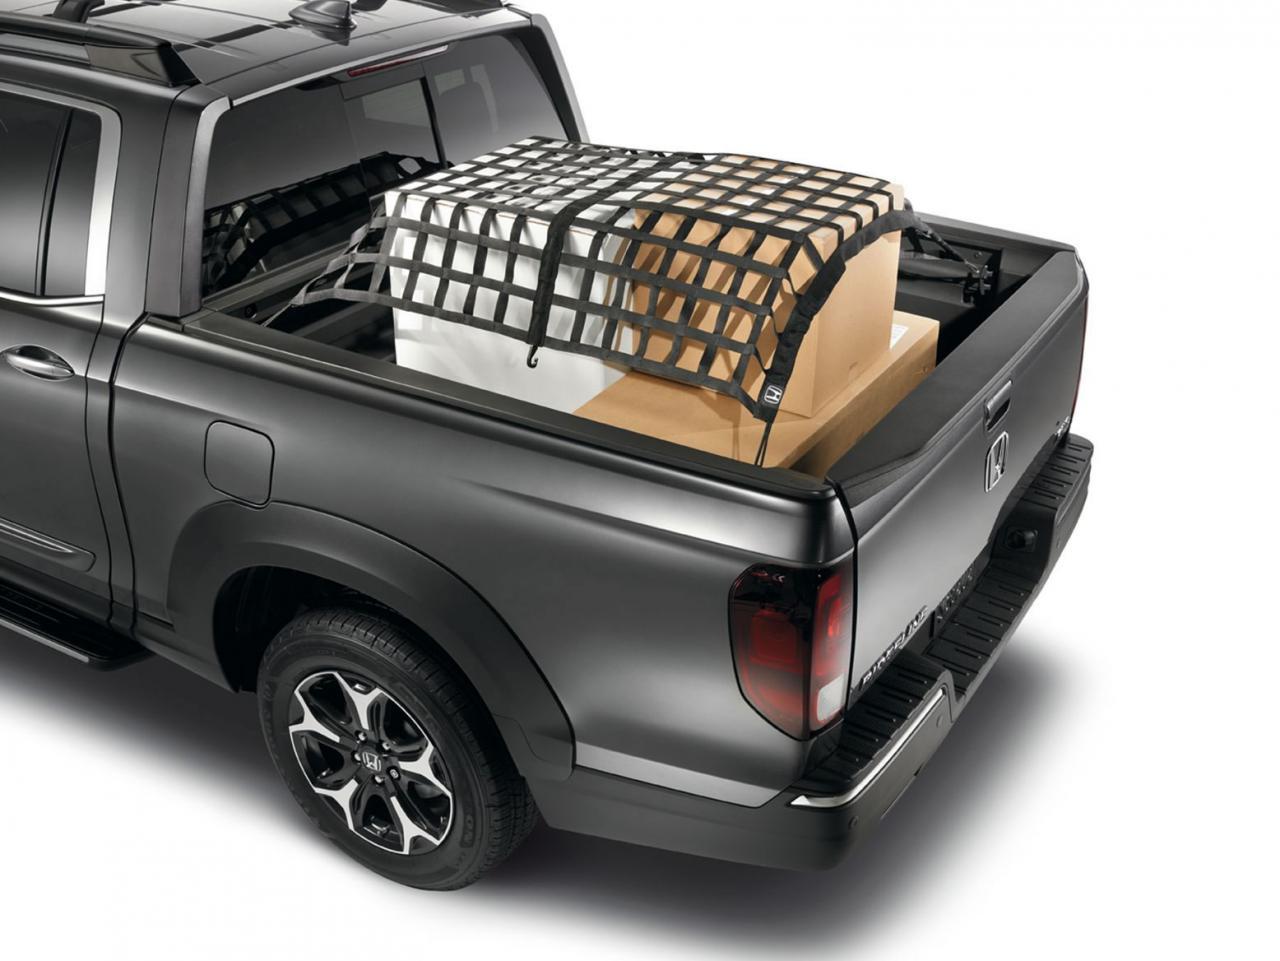 Name 2017 ridgeline ext acc trunk cargo net